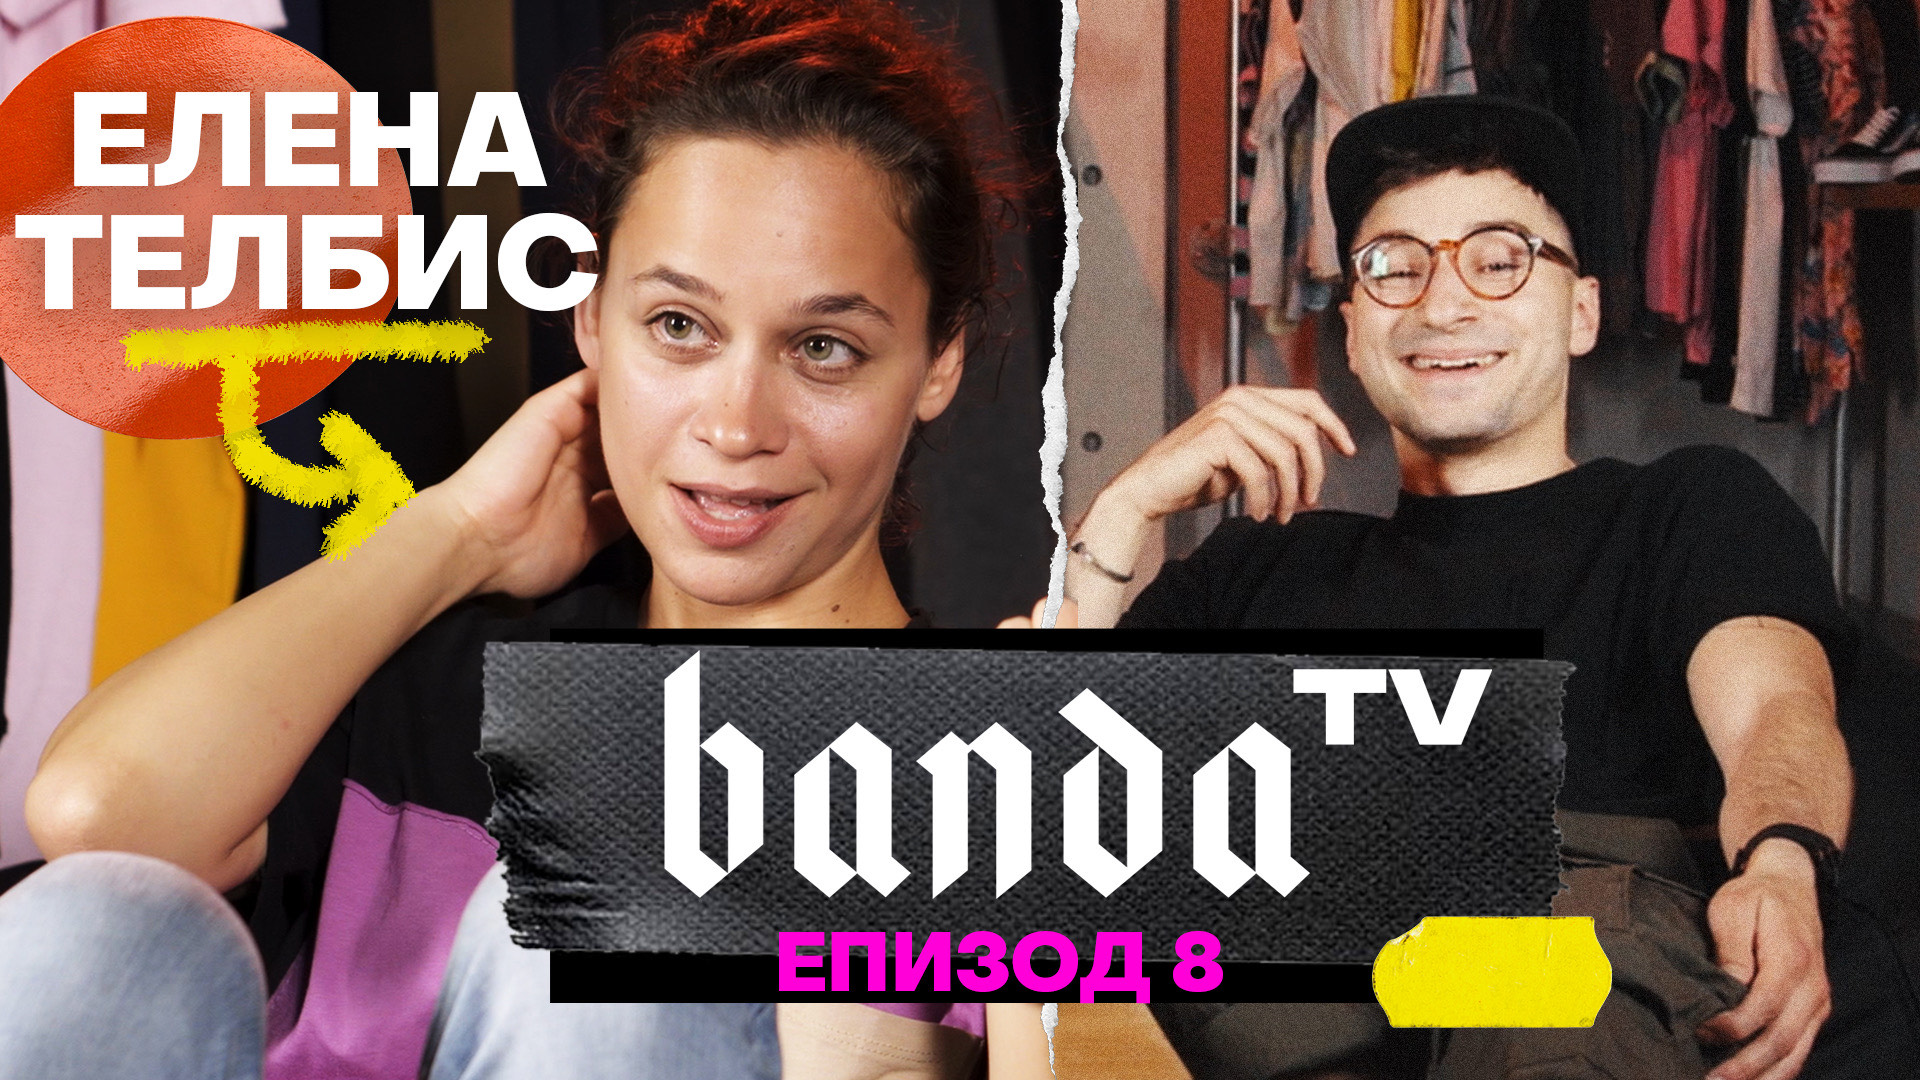 Banda TV - Eпизод 8 с Елена Телбис